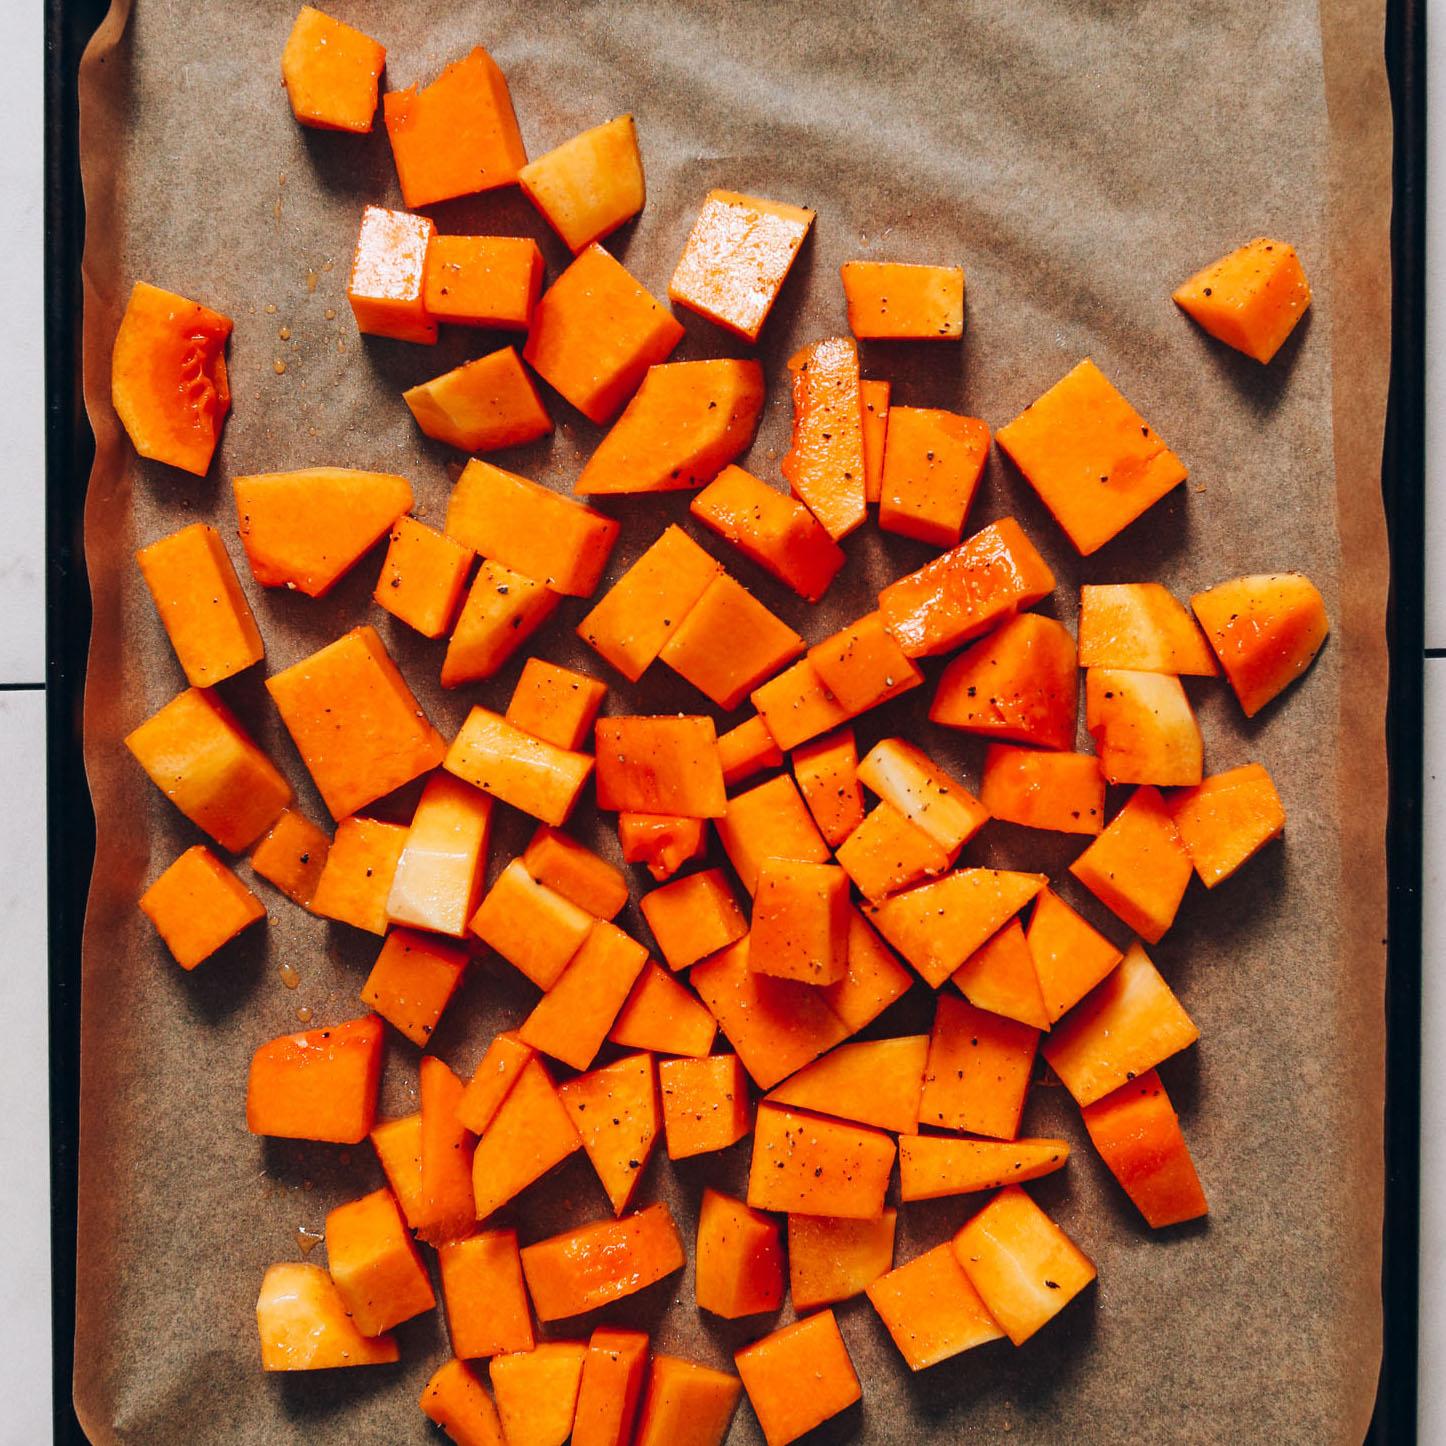 Roasted Butternut Squash 30 Minutes Minimalist Baker Recipes